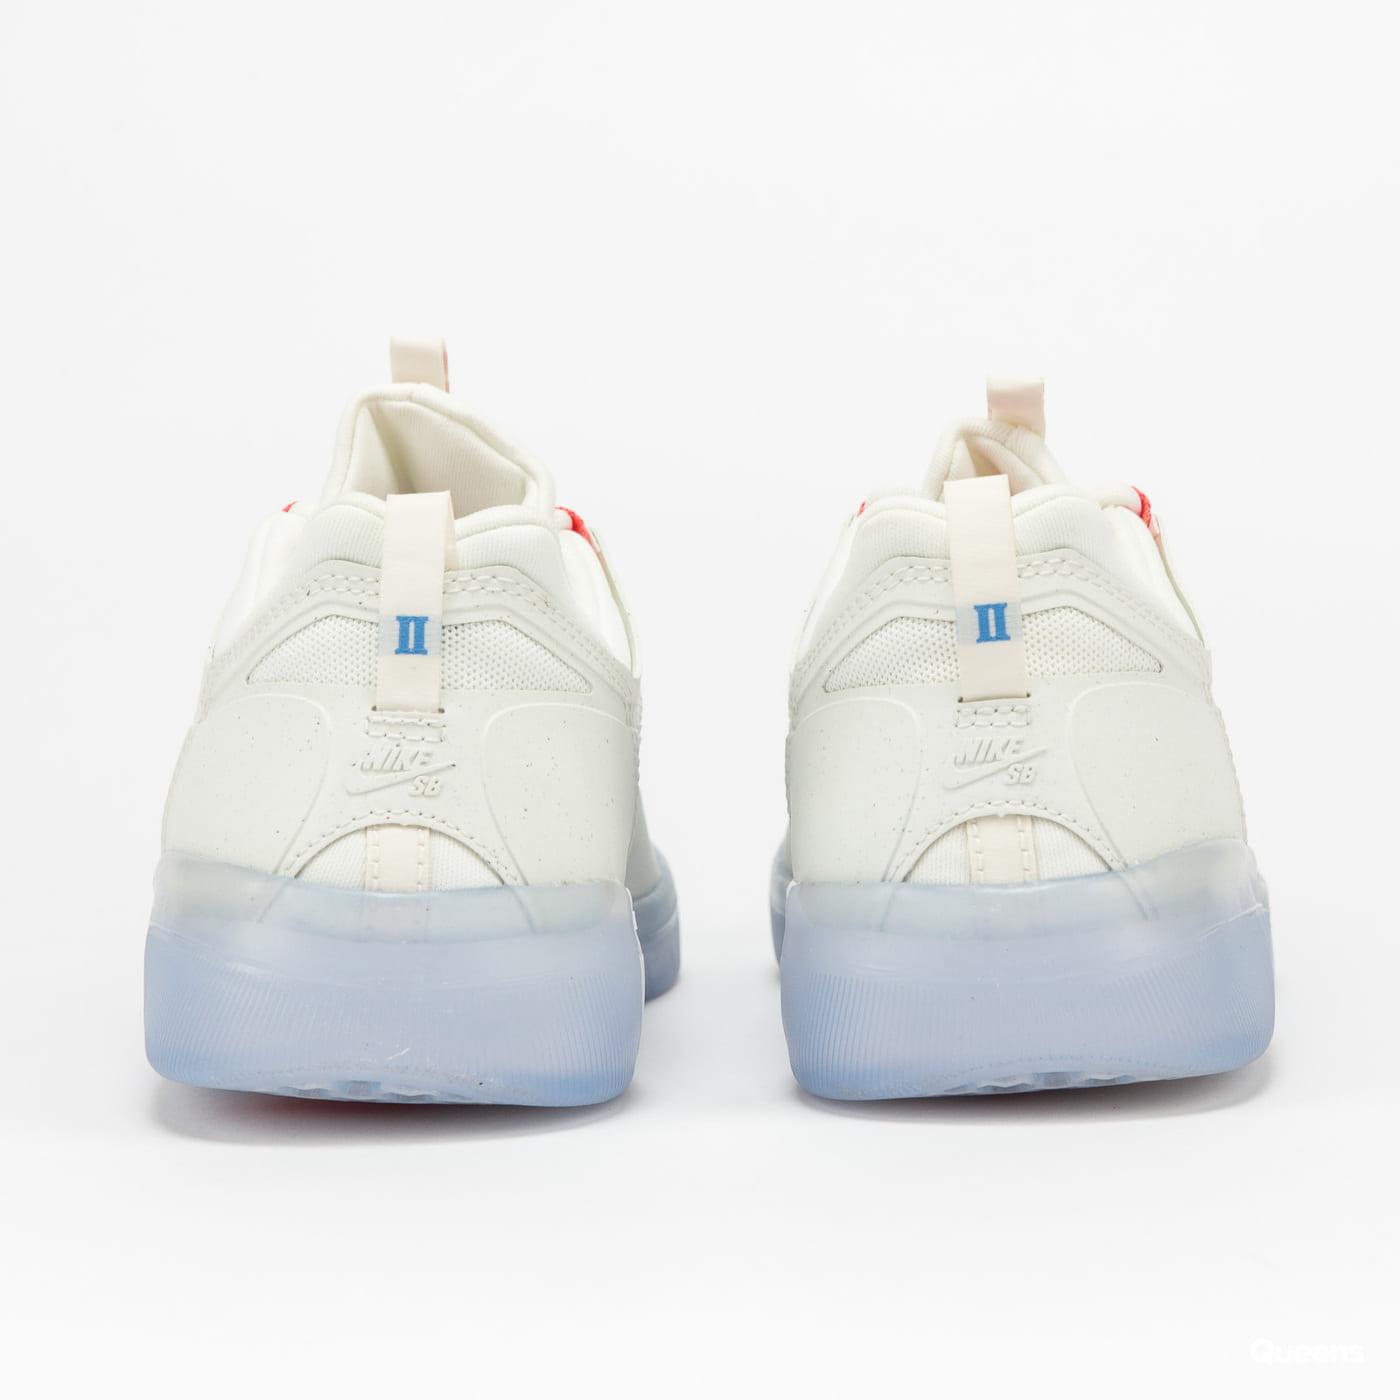 Nike SB Nyjah Free 2 summit white / coast - pink salt